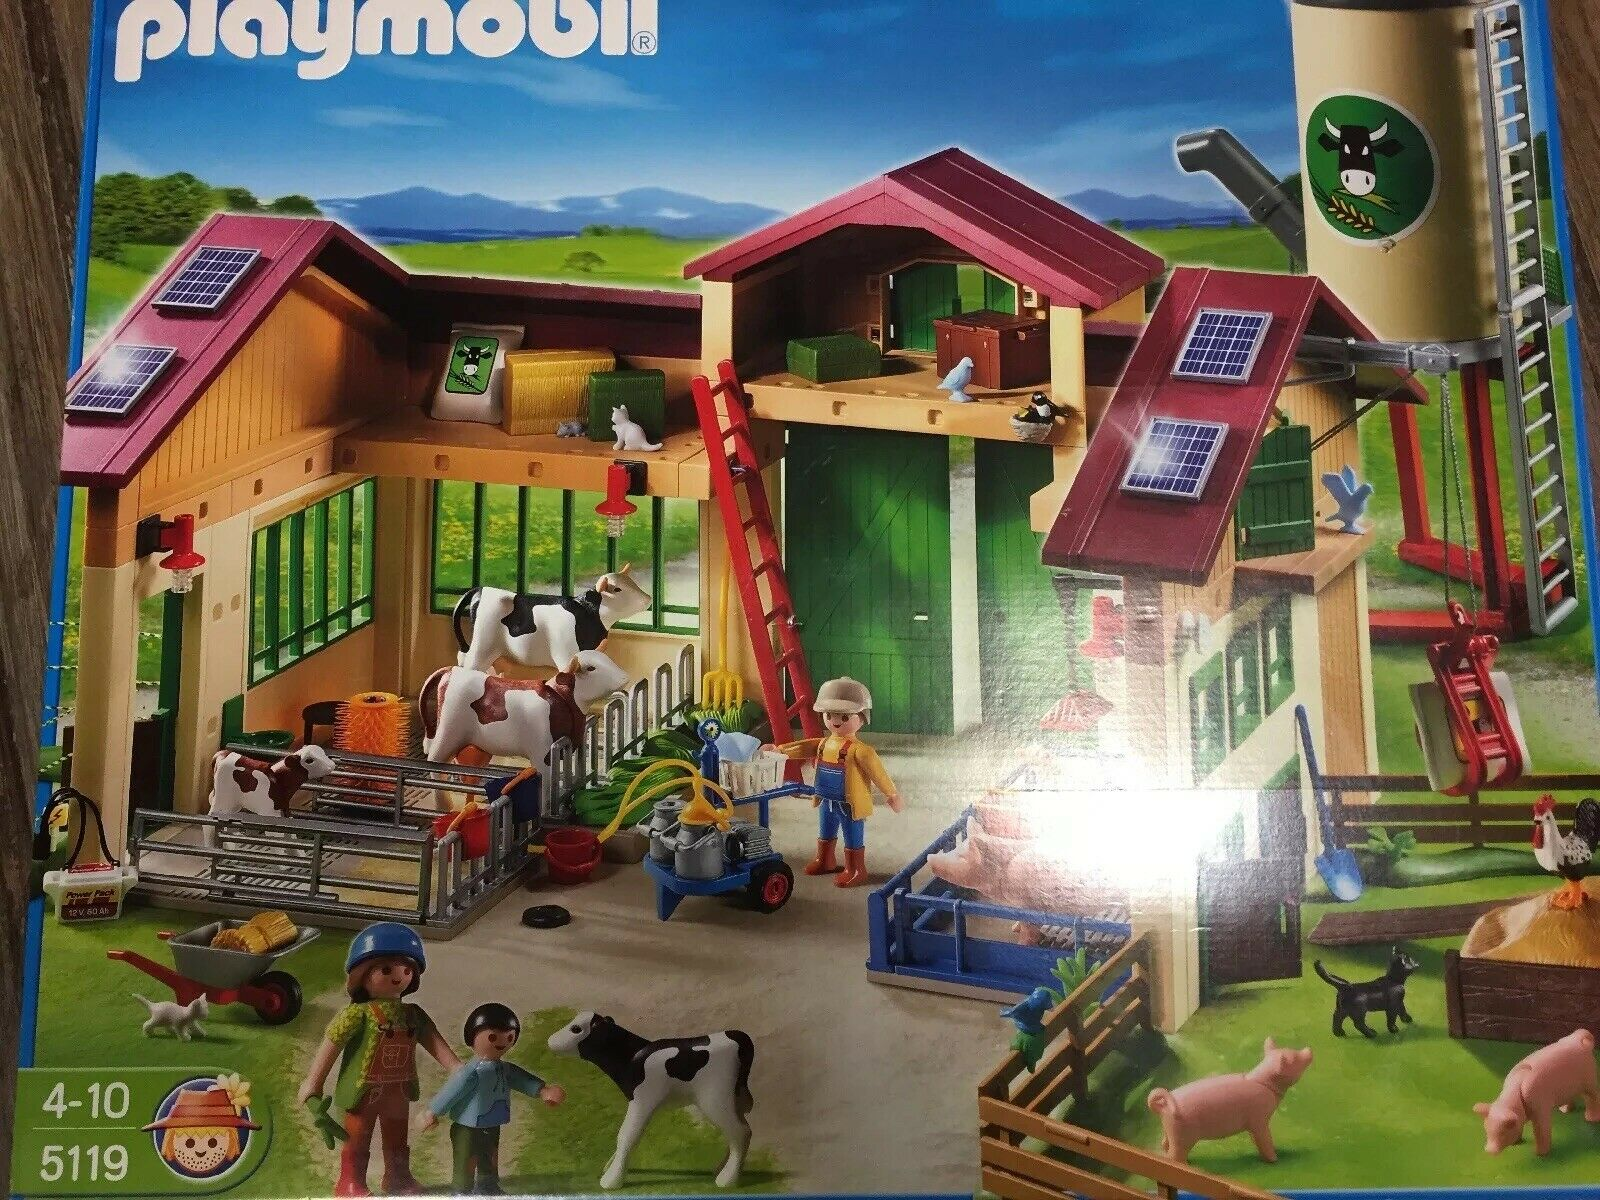 Schöner großer Playmobil-Bauernhof 5119+6209+4496+5124, neuwertig + OVP